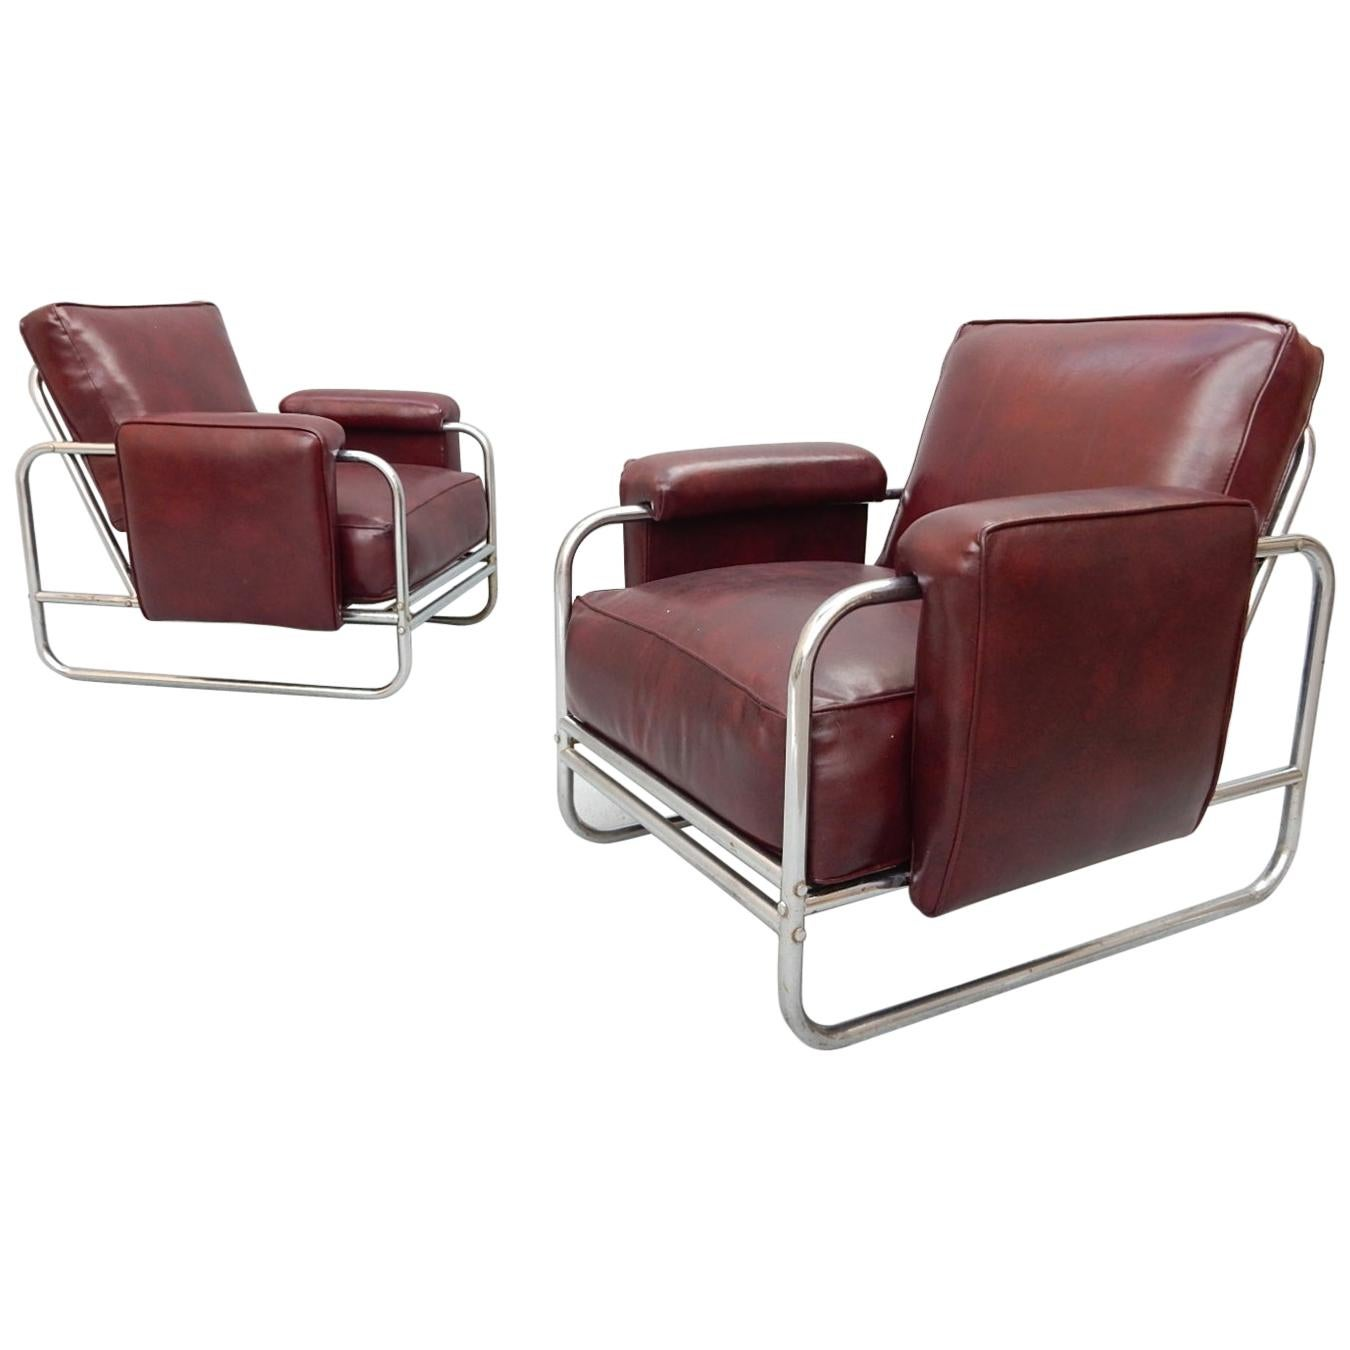 Pair of Original Art Deco Lounge Chairs, 1930s